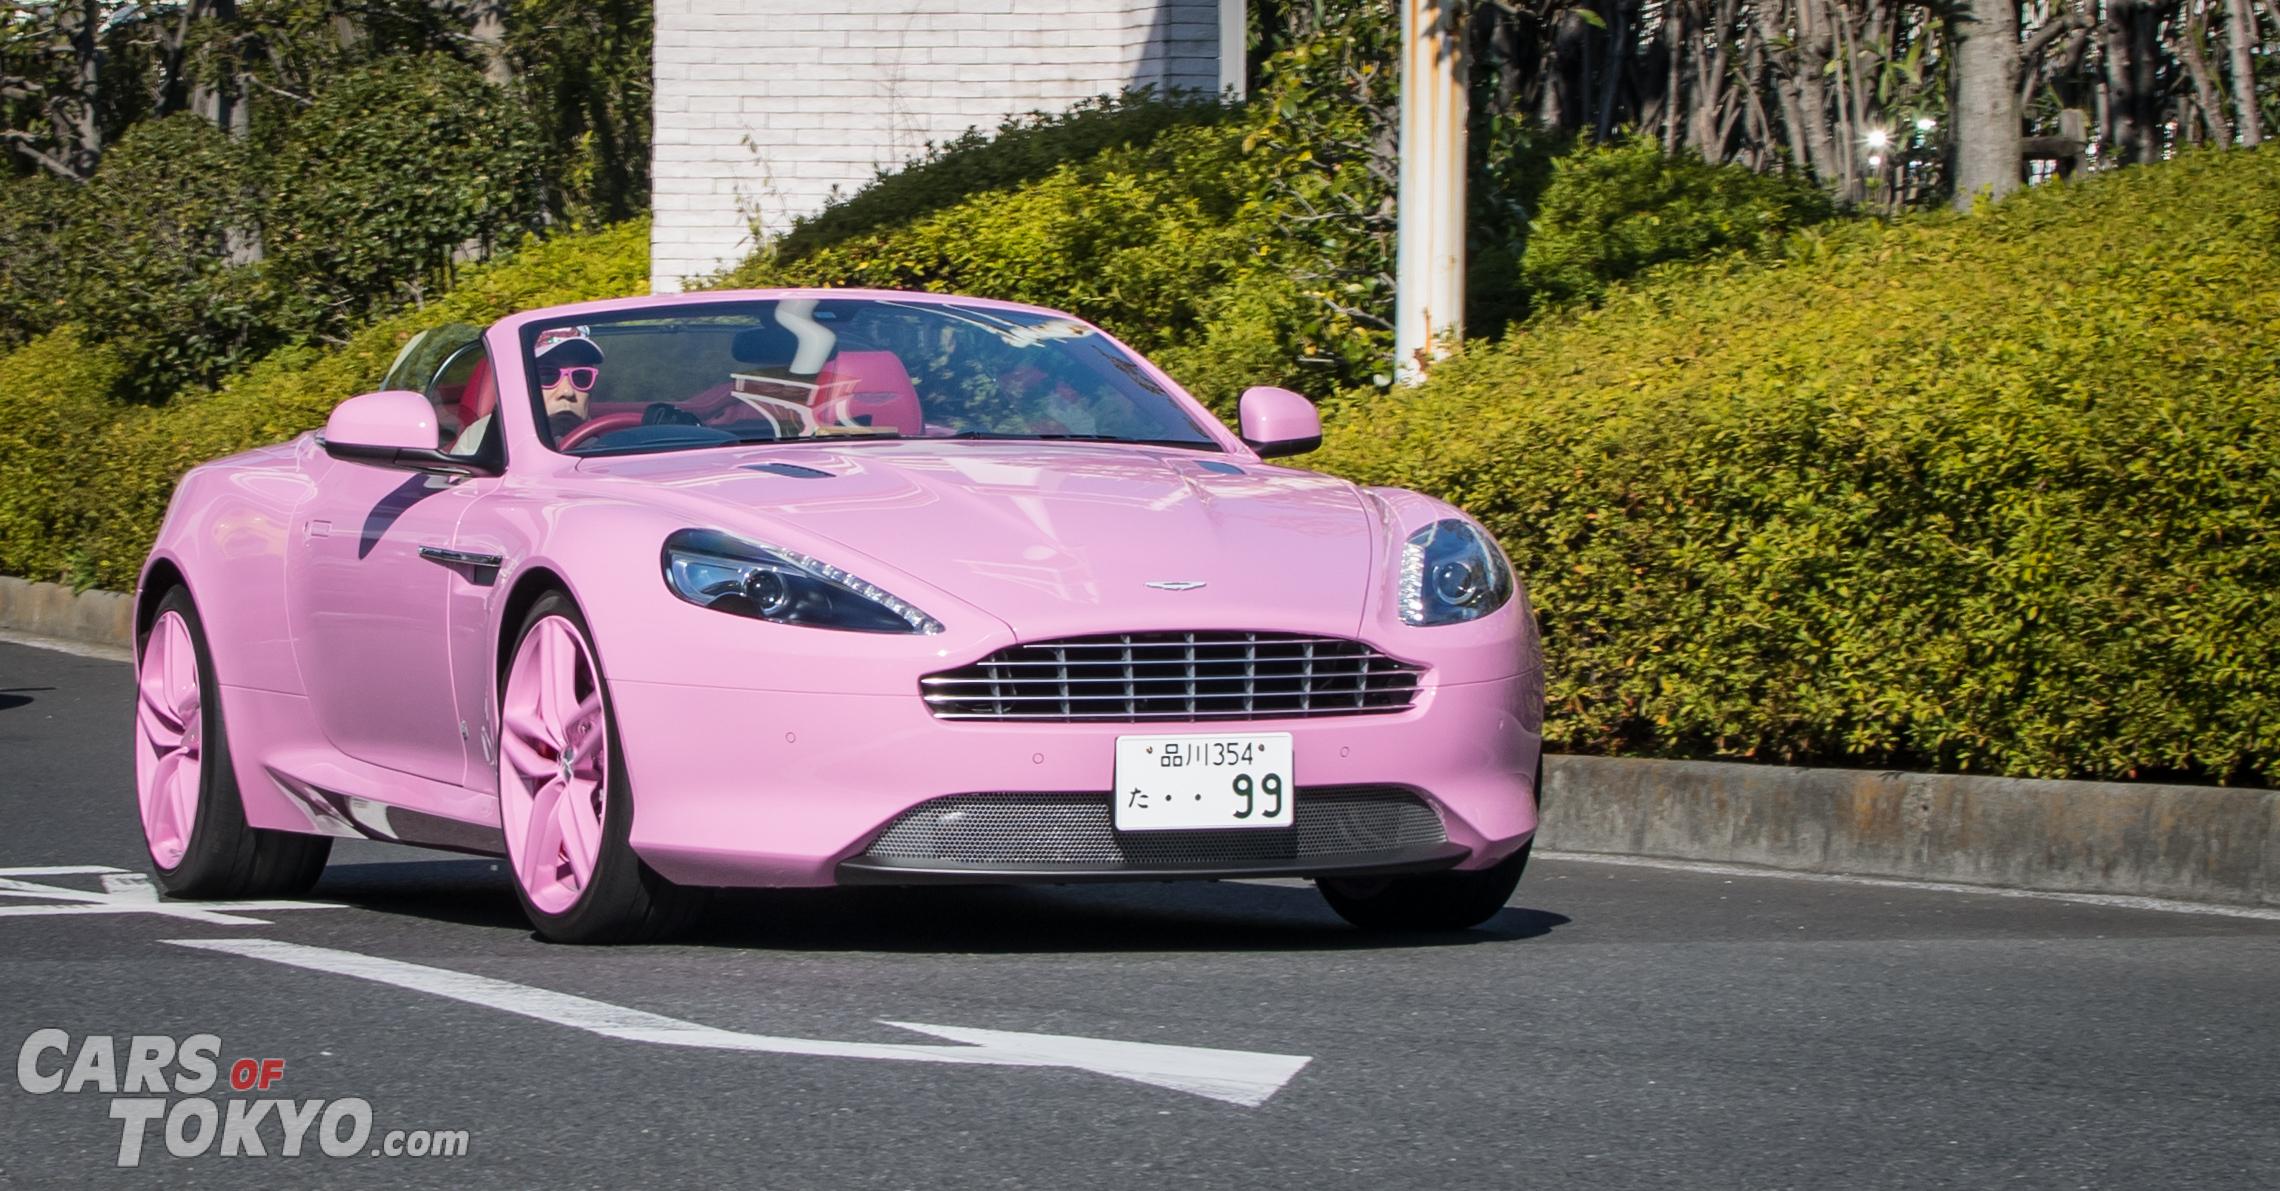 Cars of Tokyo Unusual Spec Aston Martin DB9